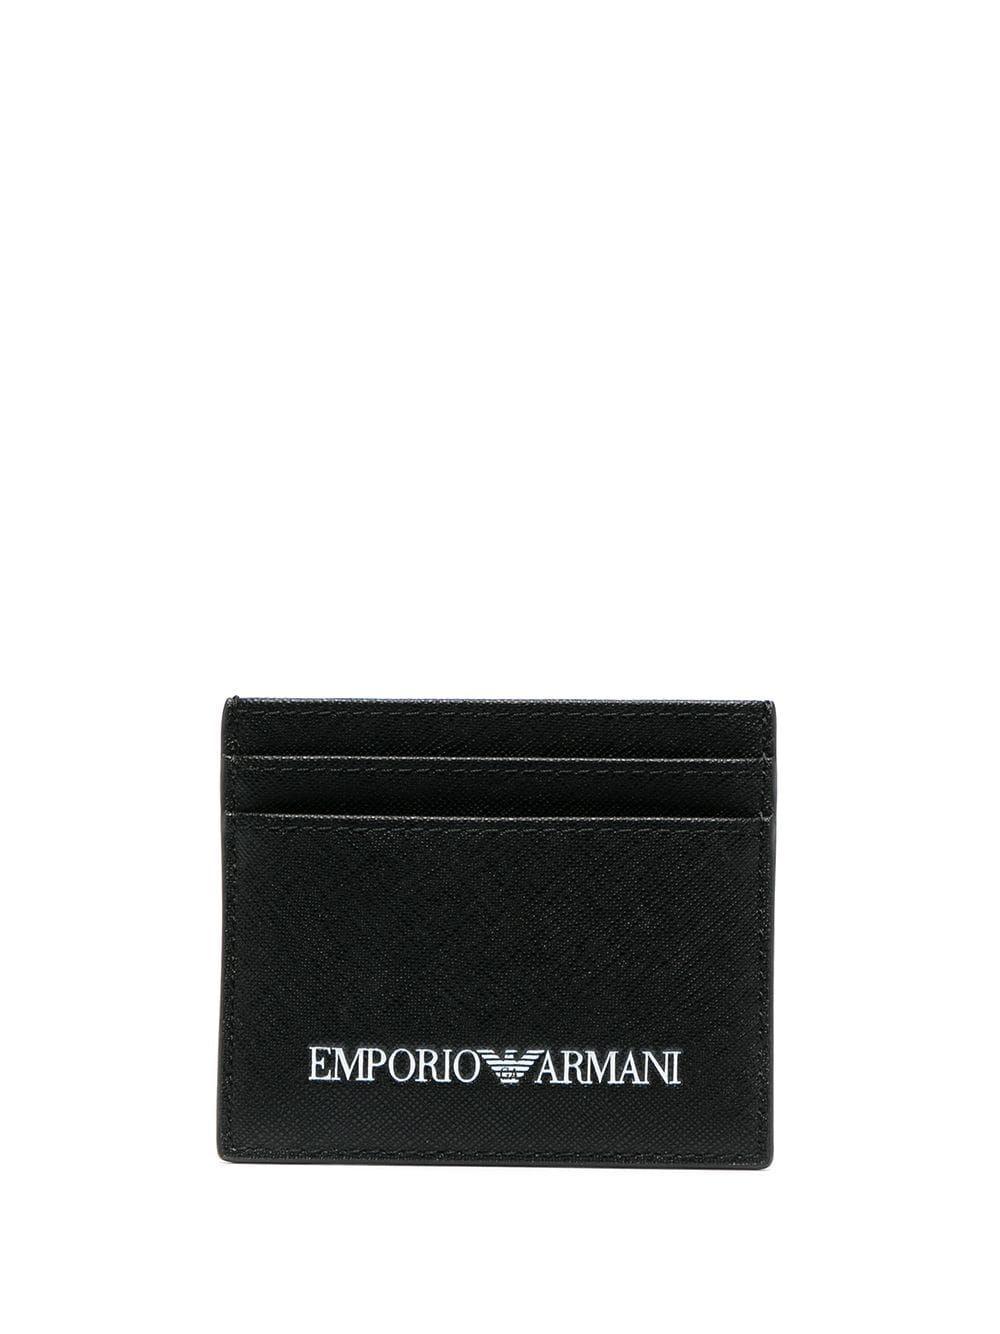 Porta carte credito con logo